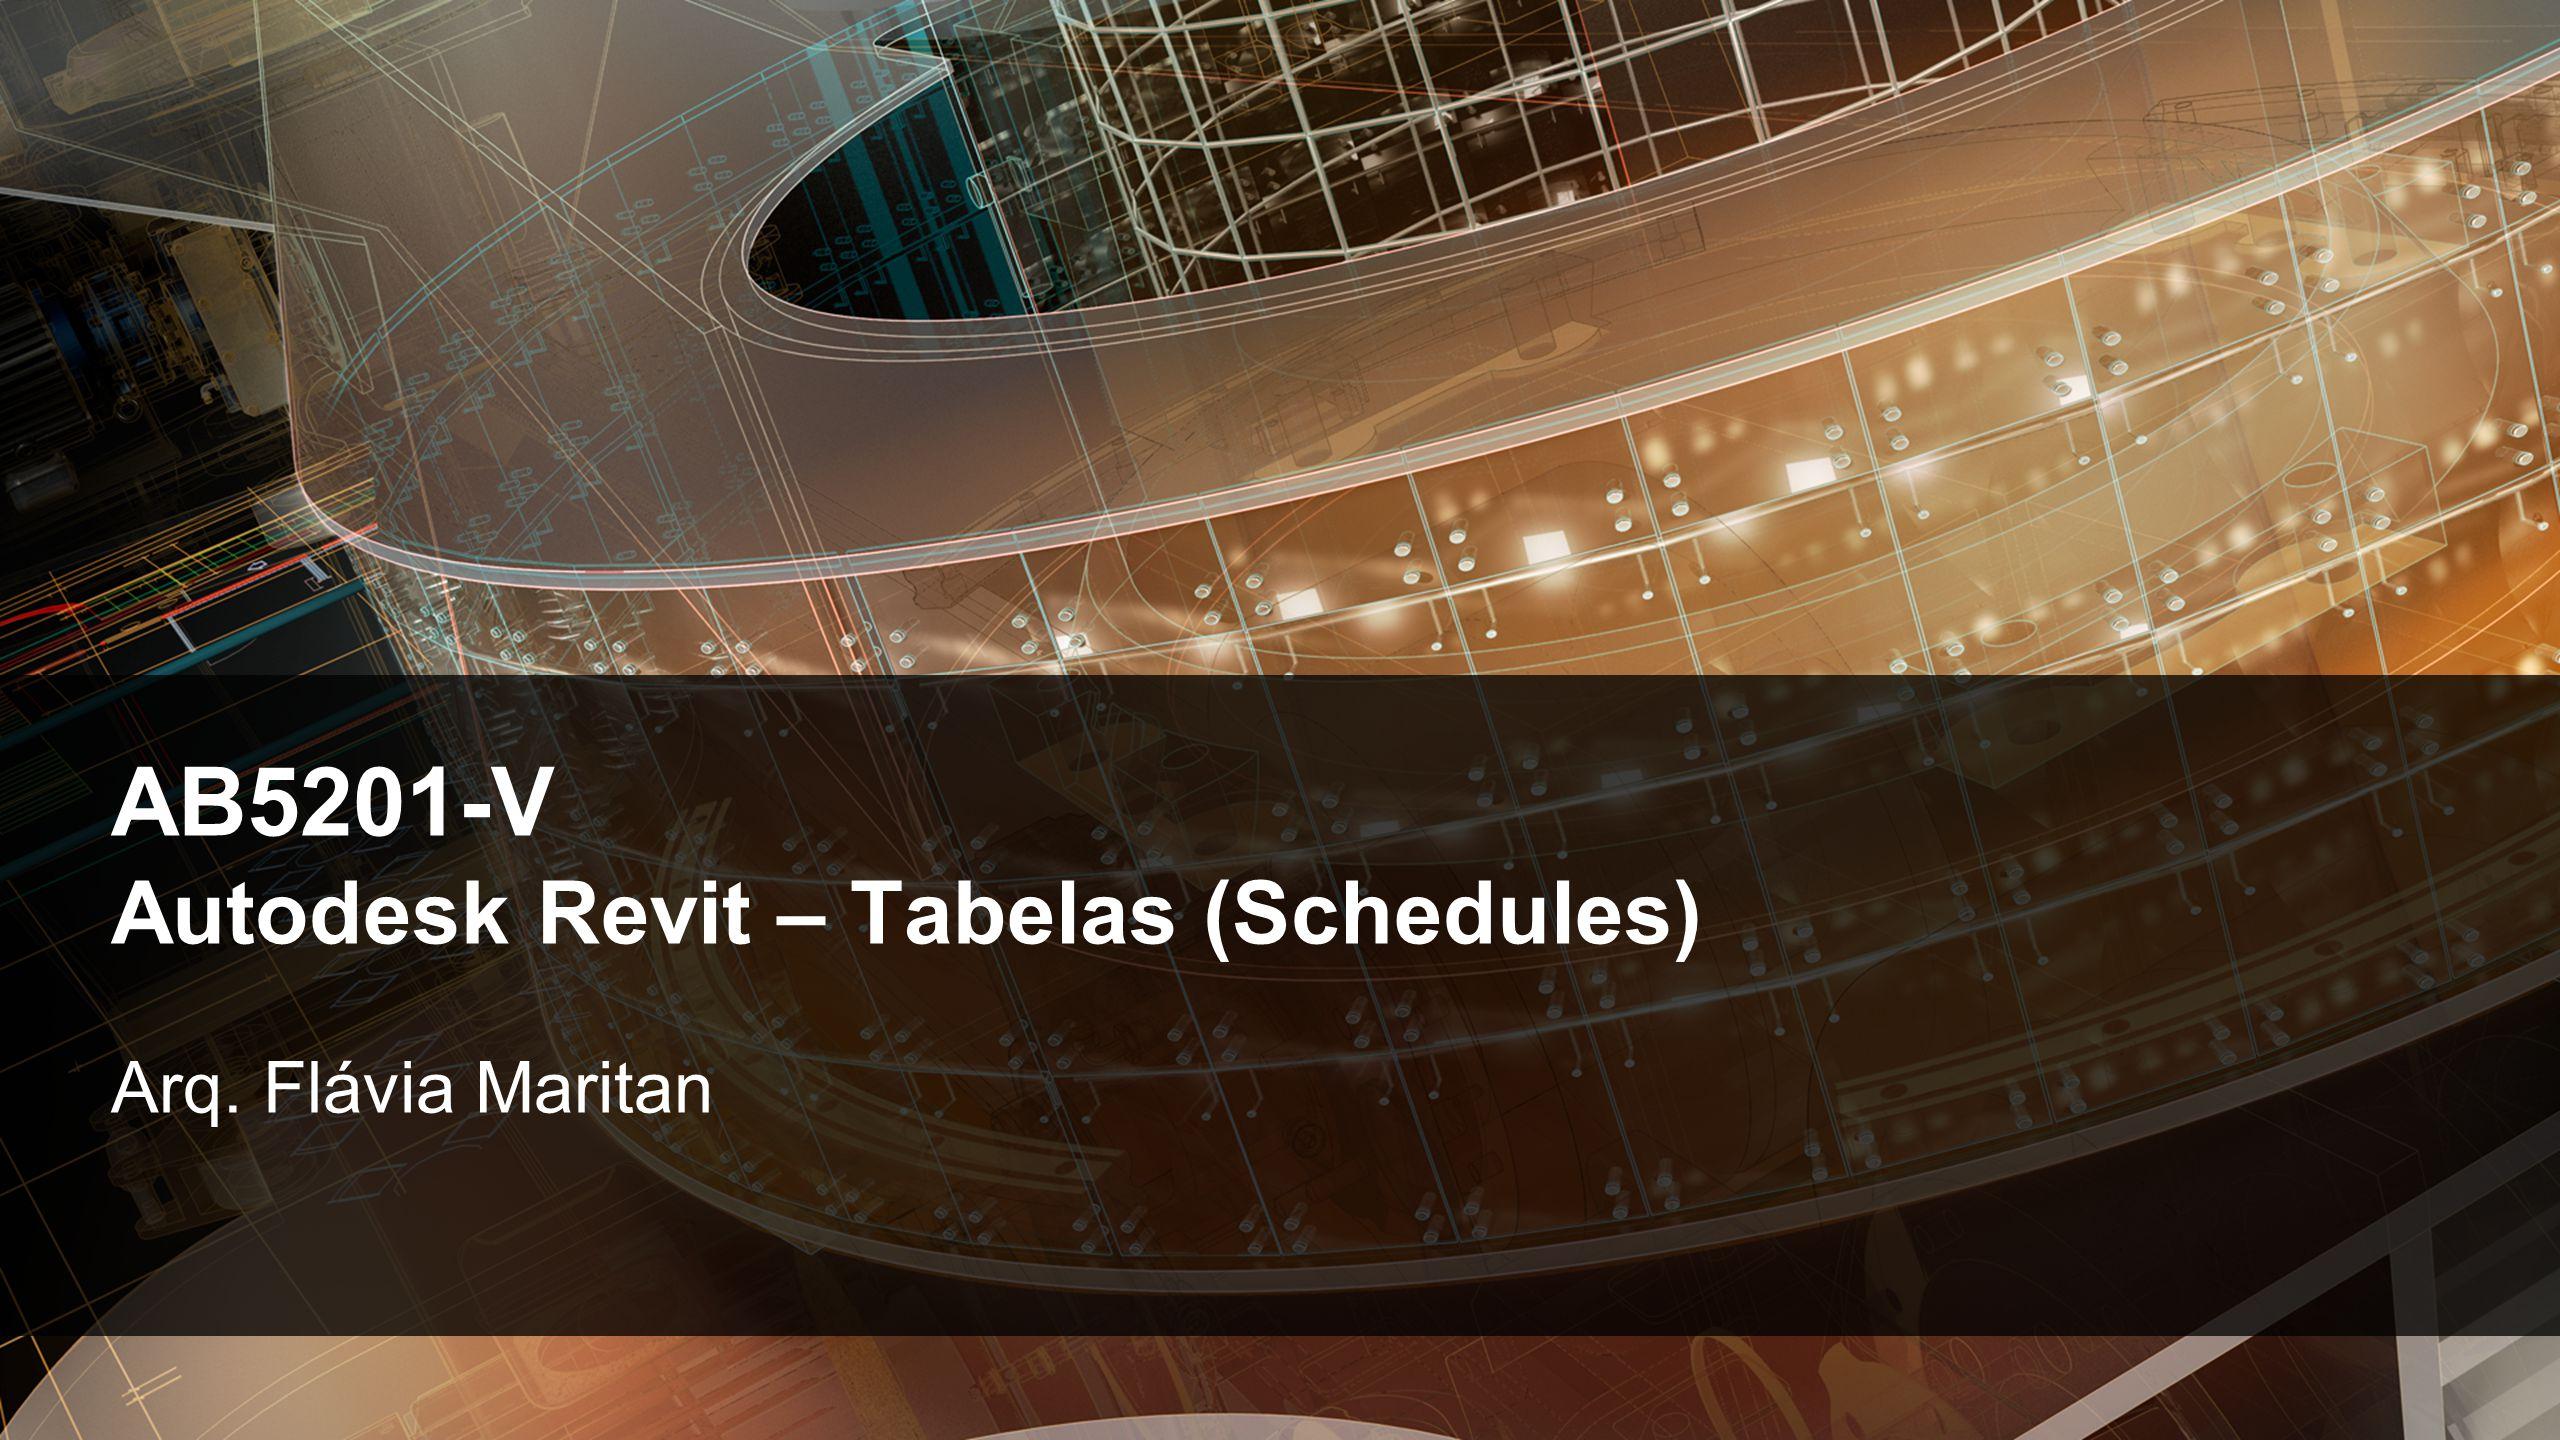 AB5201-V Autodesk Revit – Tabelas (Schedules)